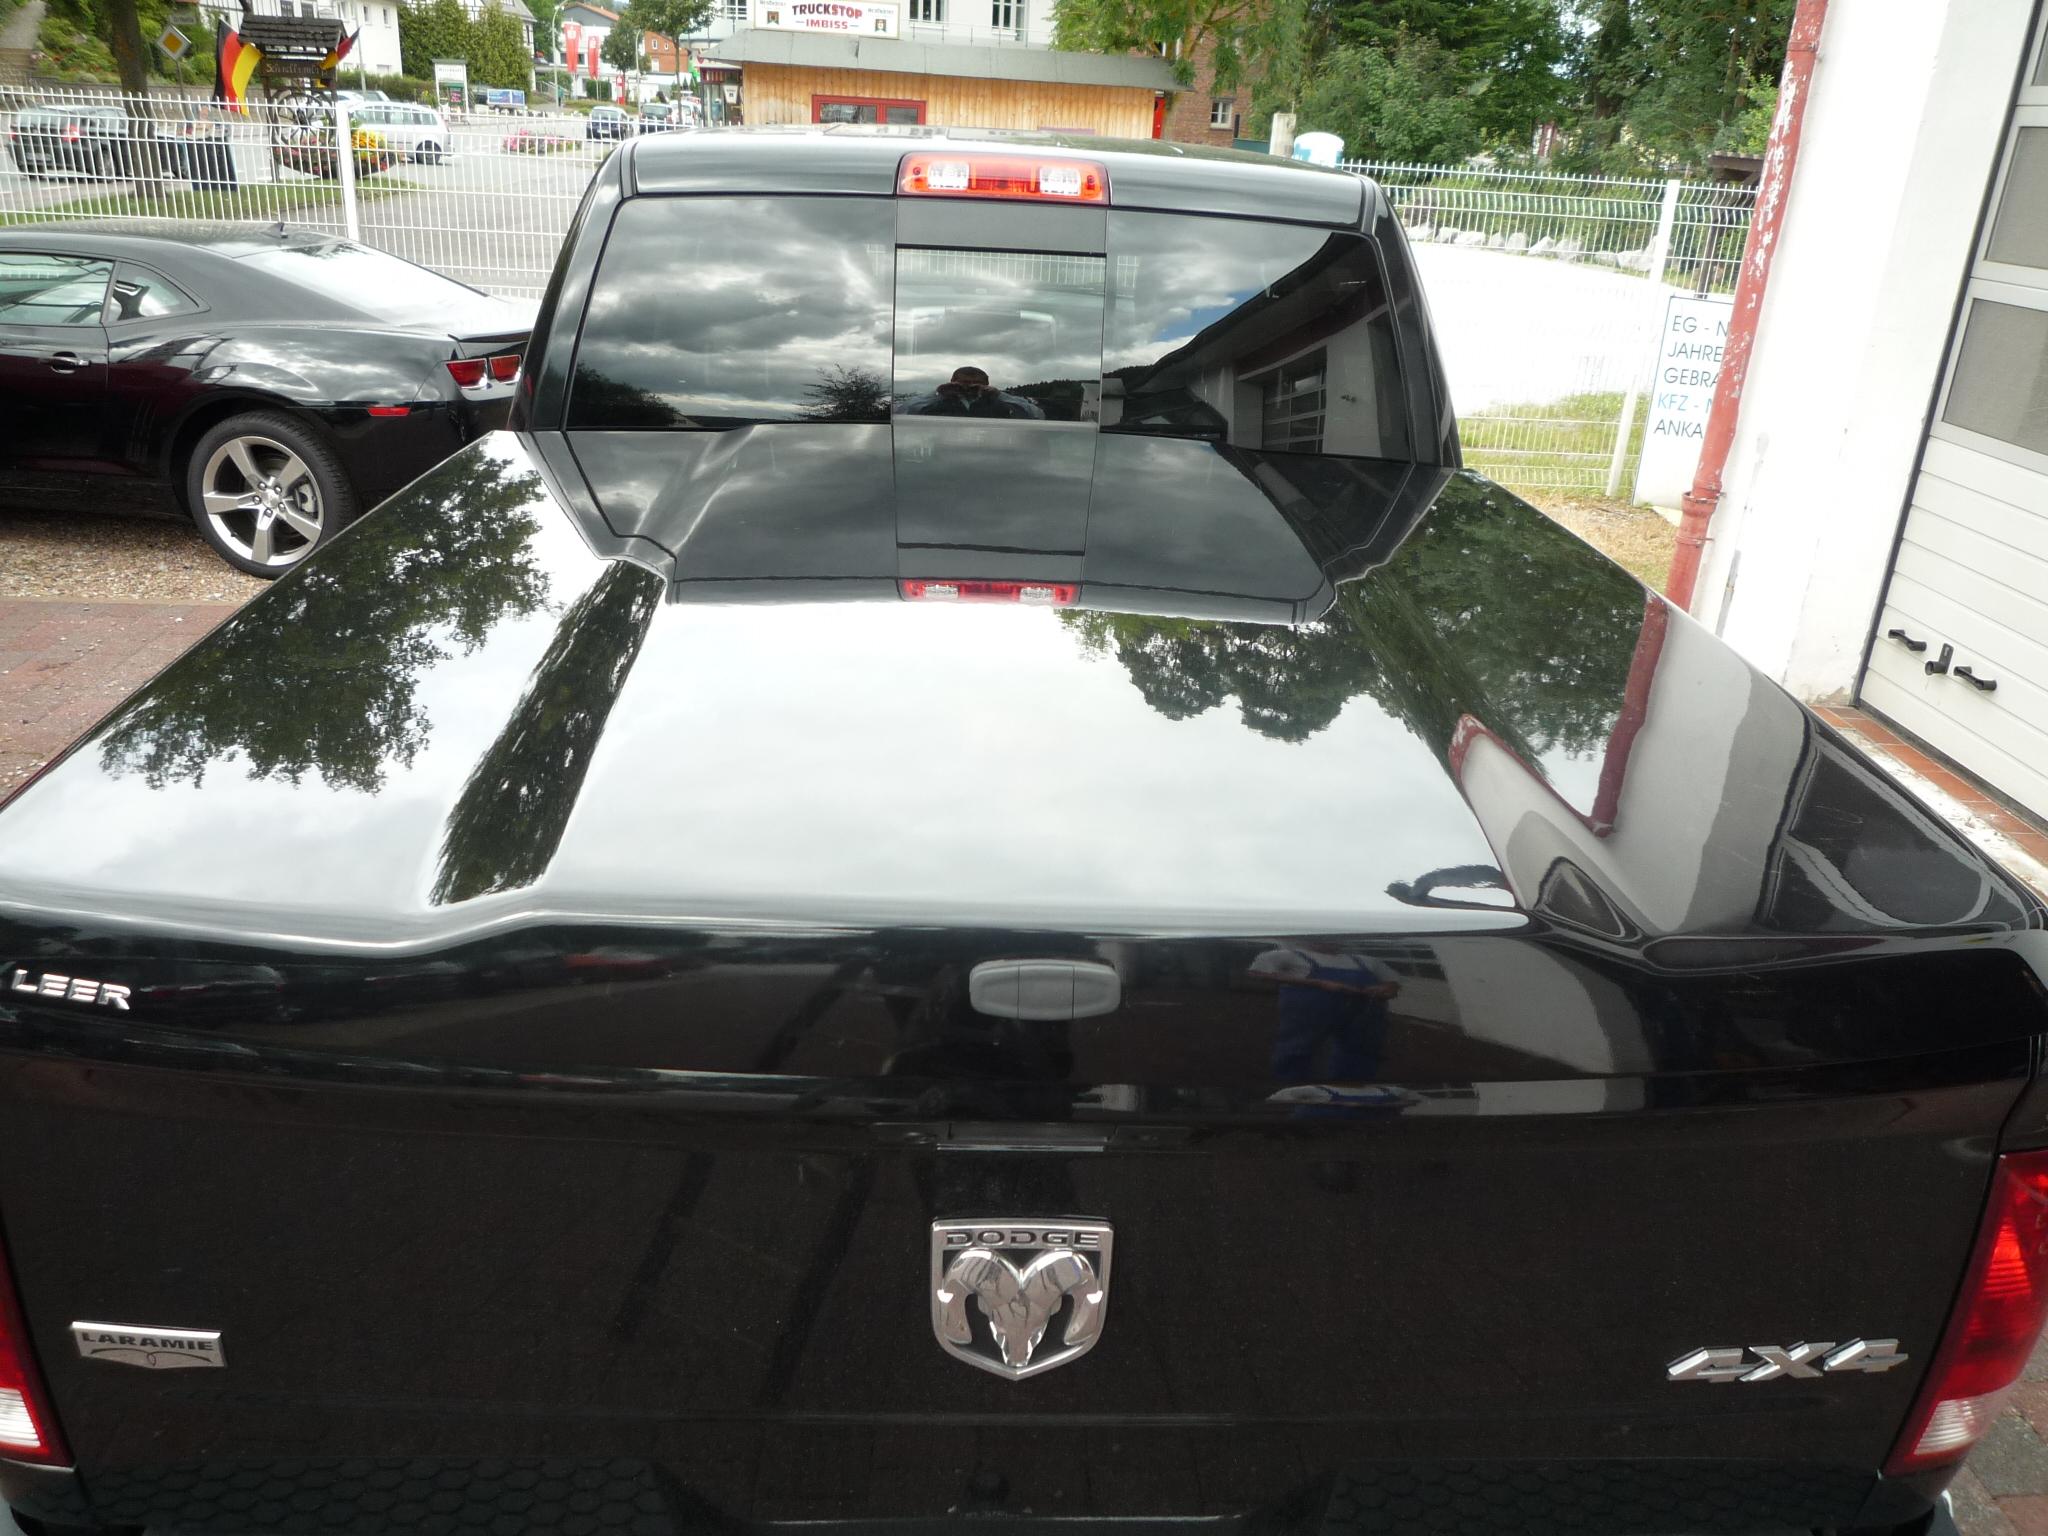 Leer 700 Laderaumabdeckung Tonneau Cover Dodge Ram 1500 Crew Cab 09 18 Schwarz